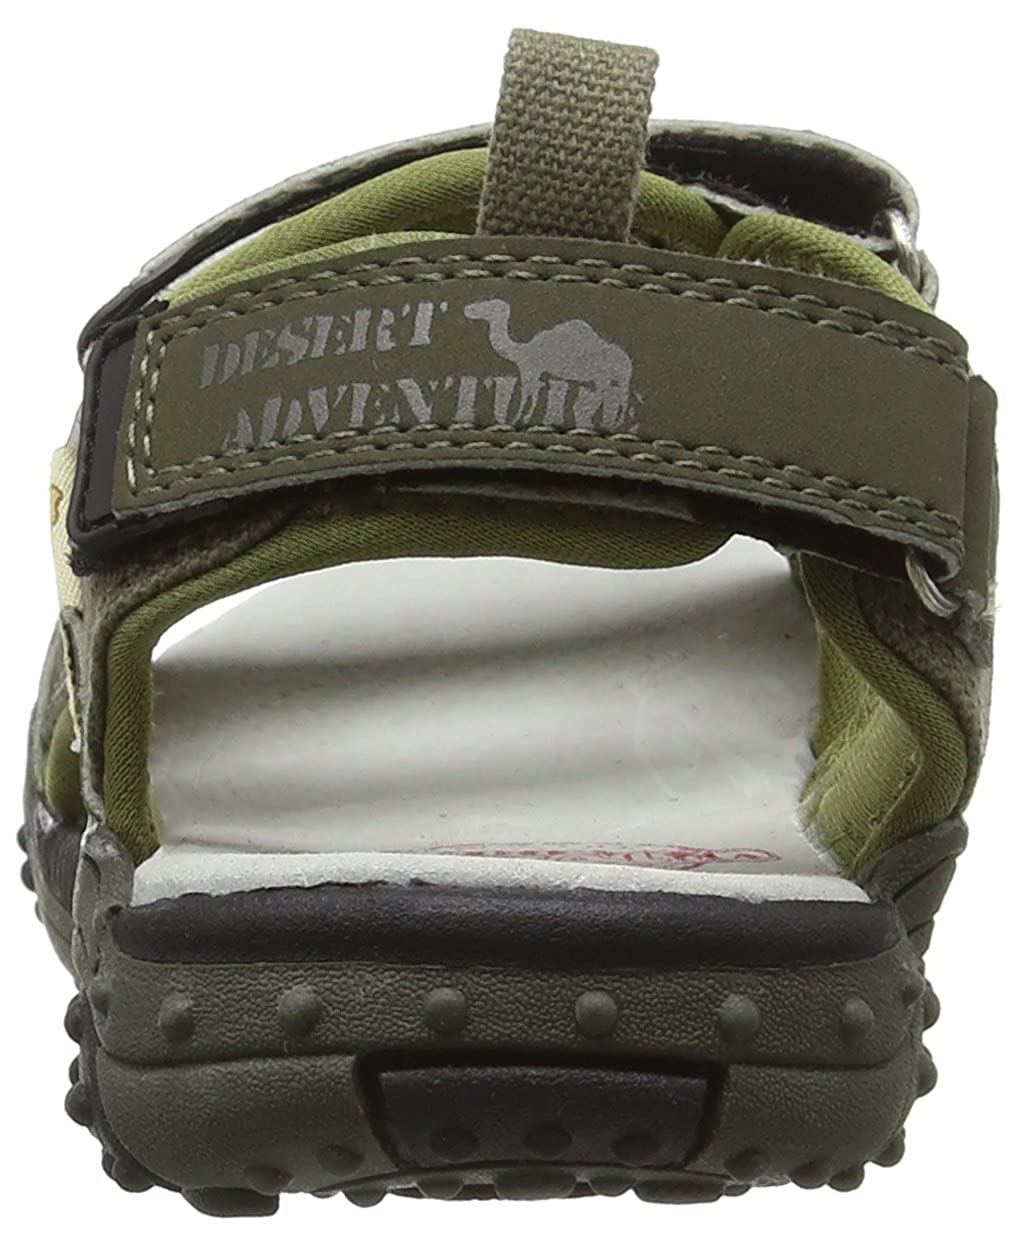 Garvalin Unisex Kids 162811b Closed Toe Sandals